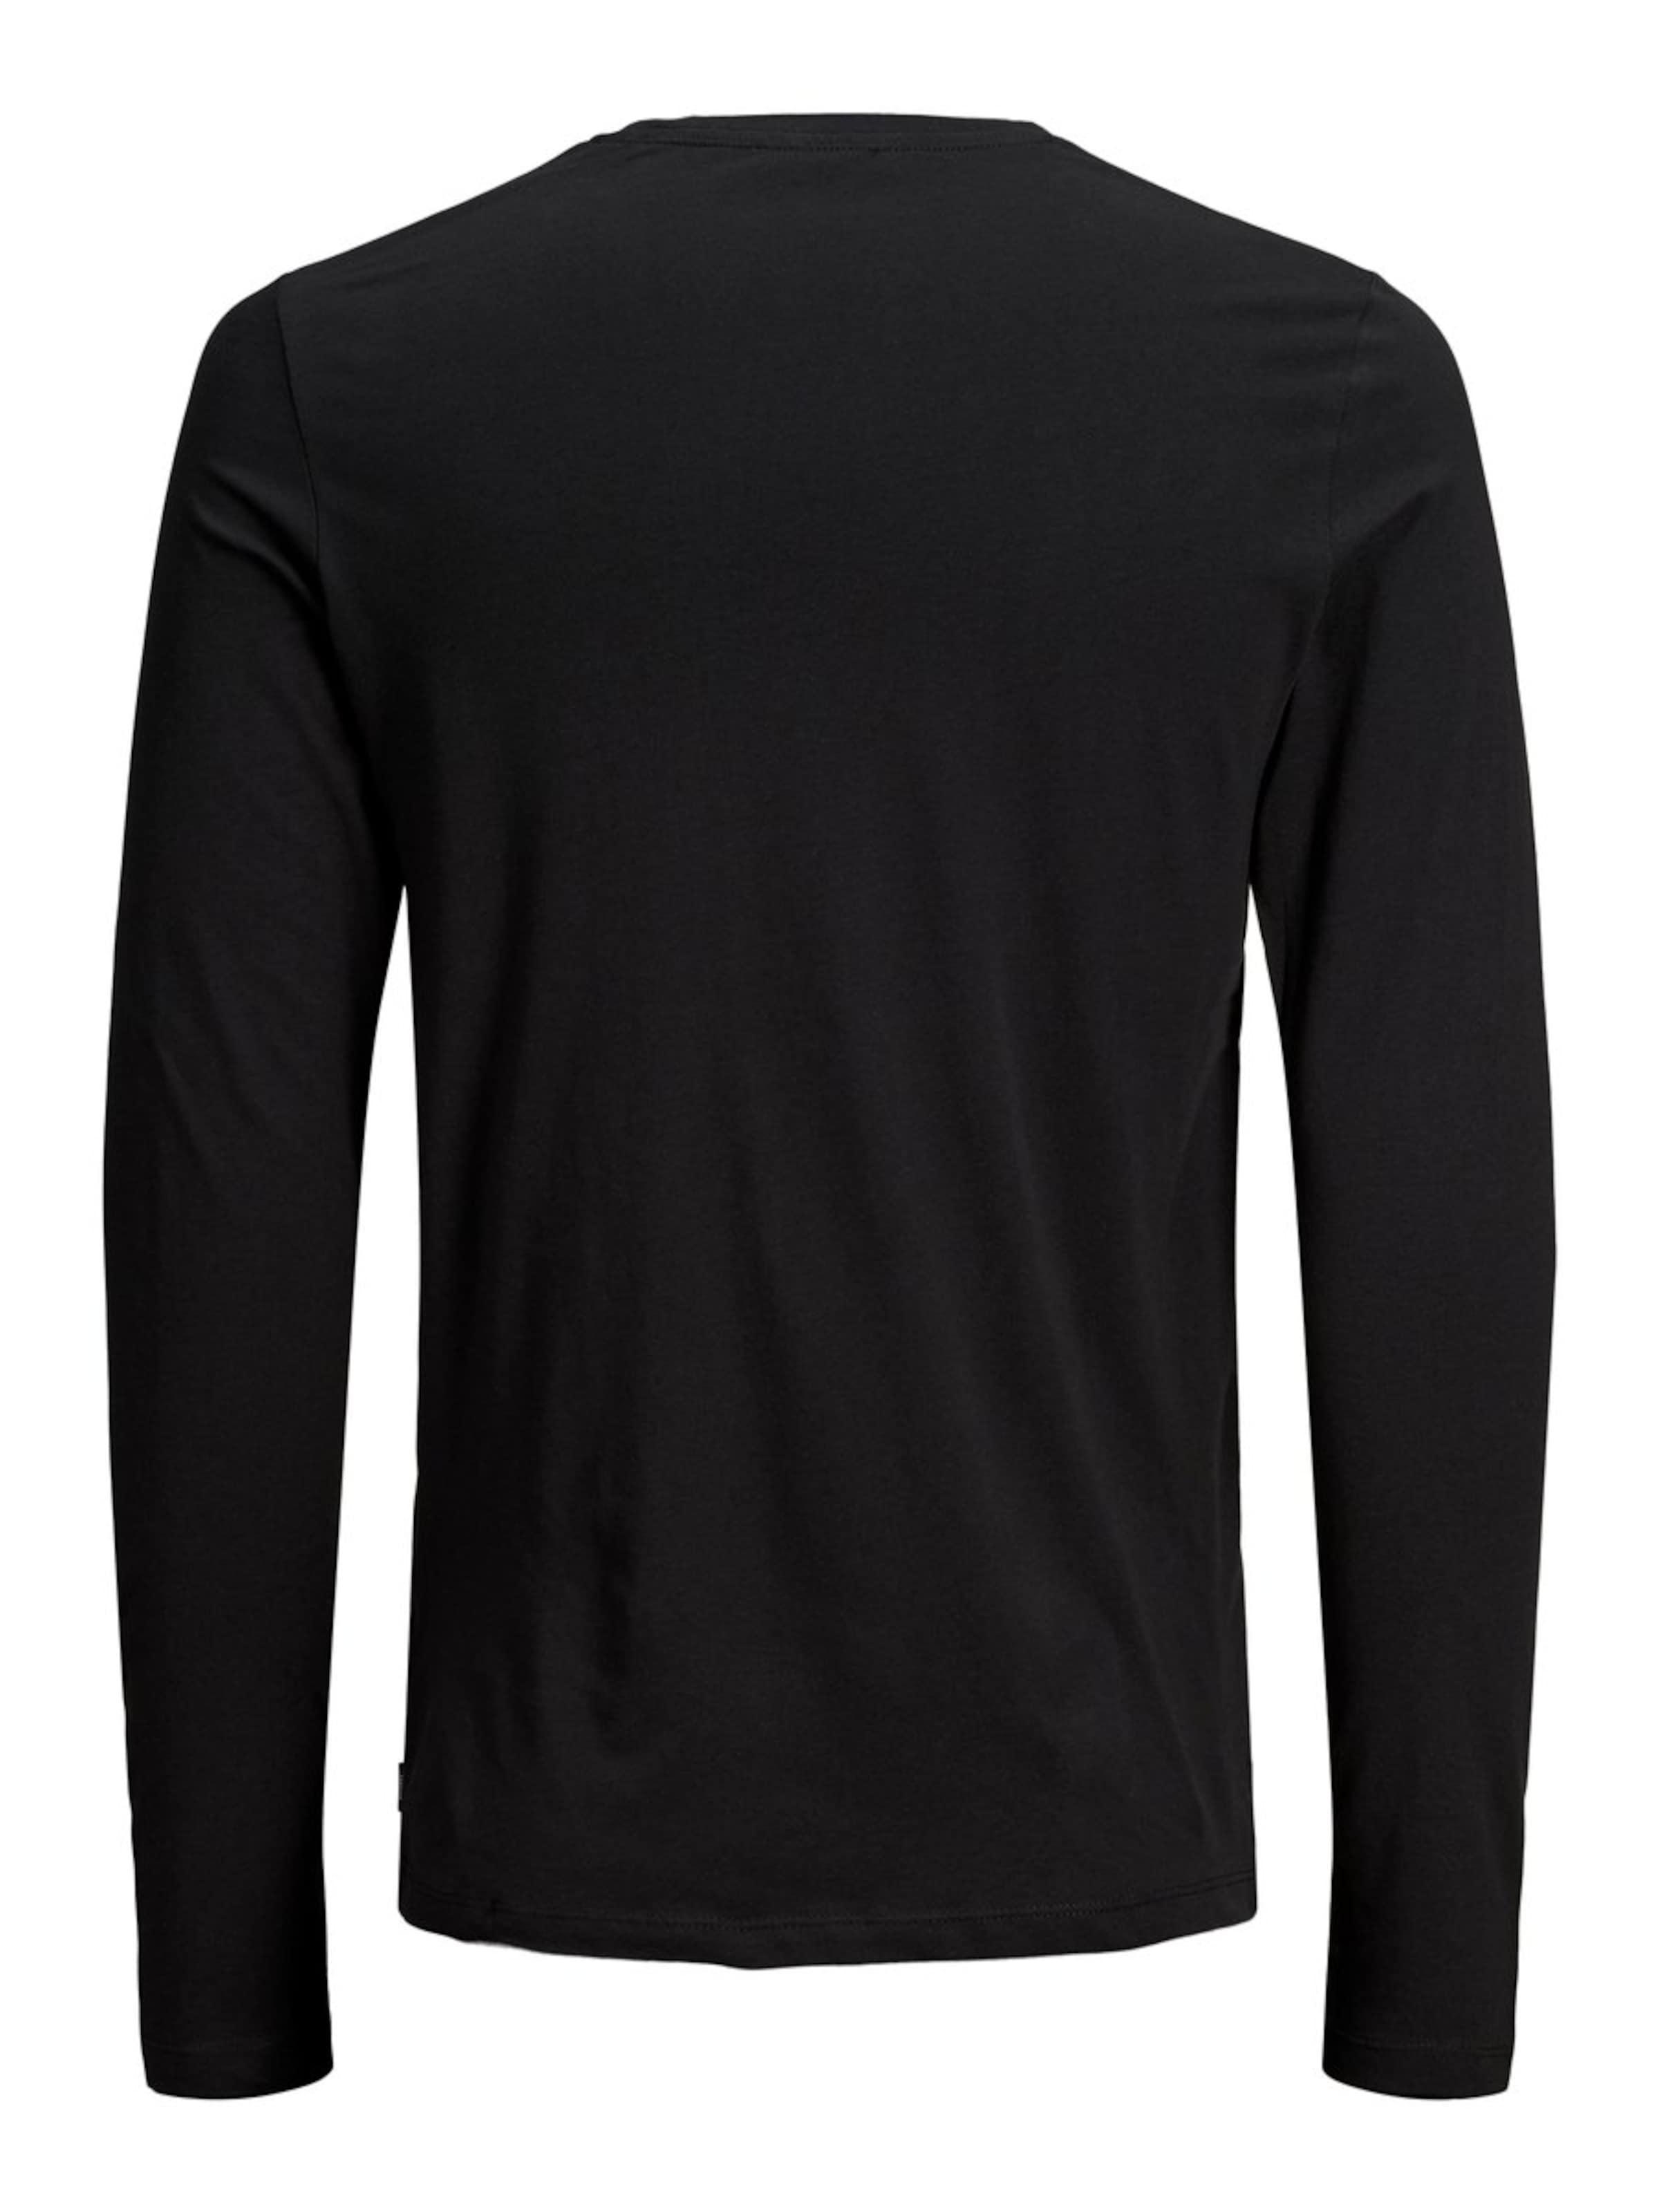 Jackamp; Jones shirt En Noir T Chiné 0PkO8nXw